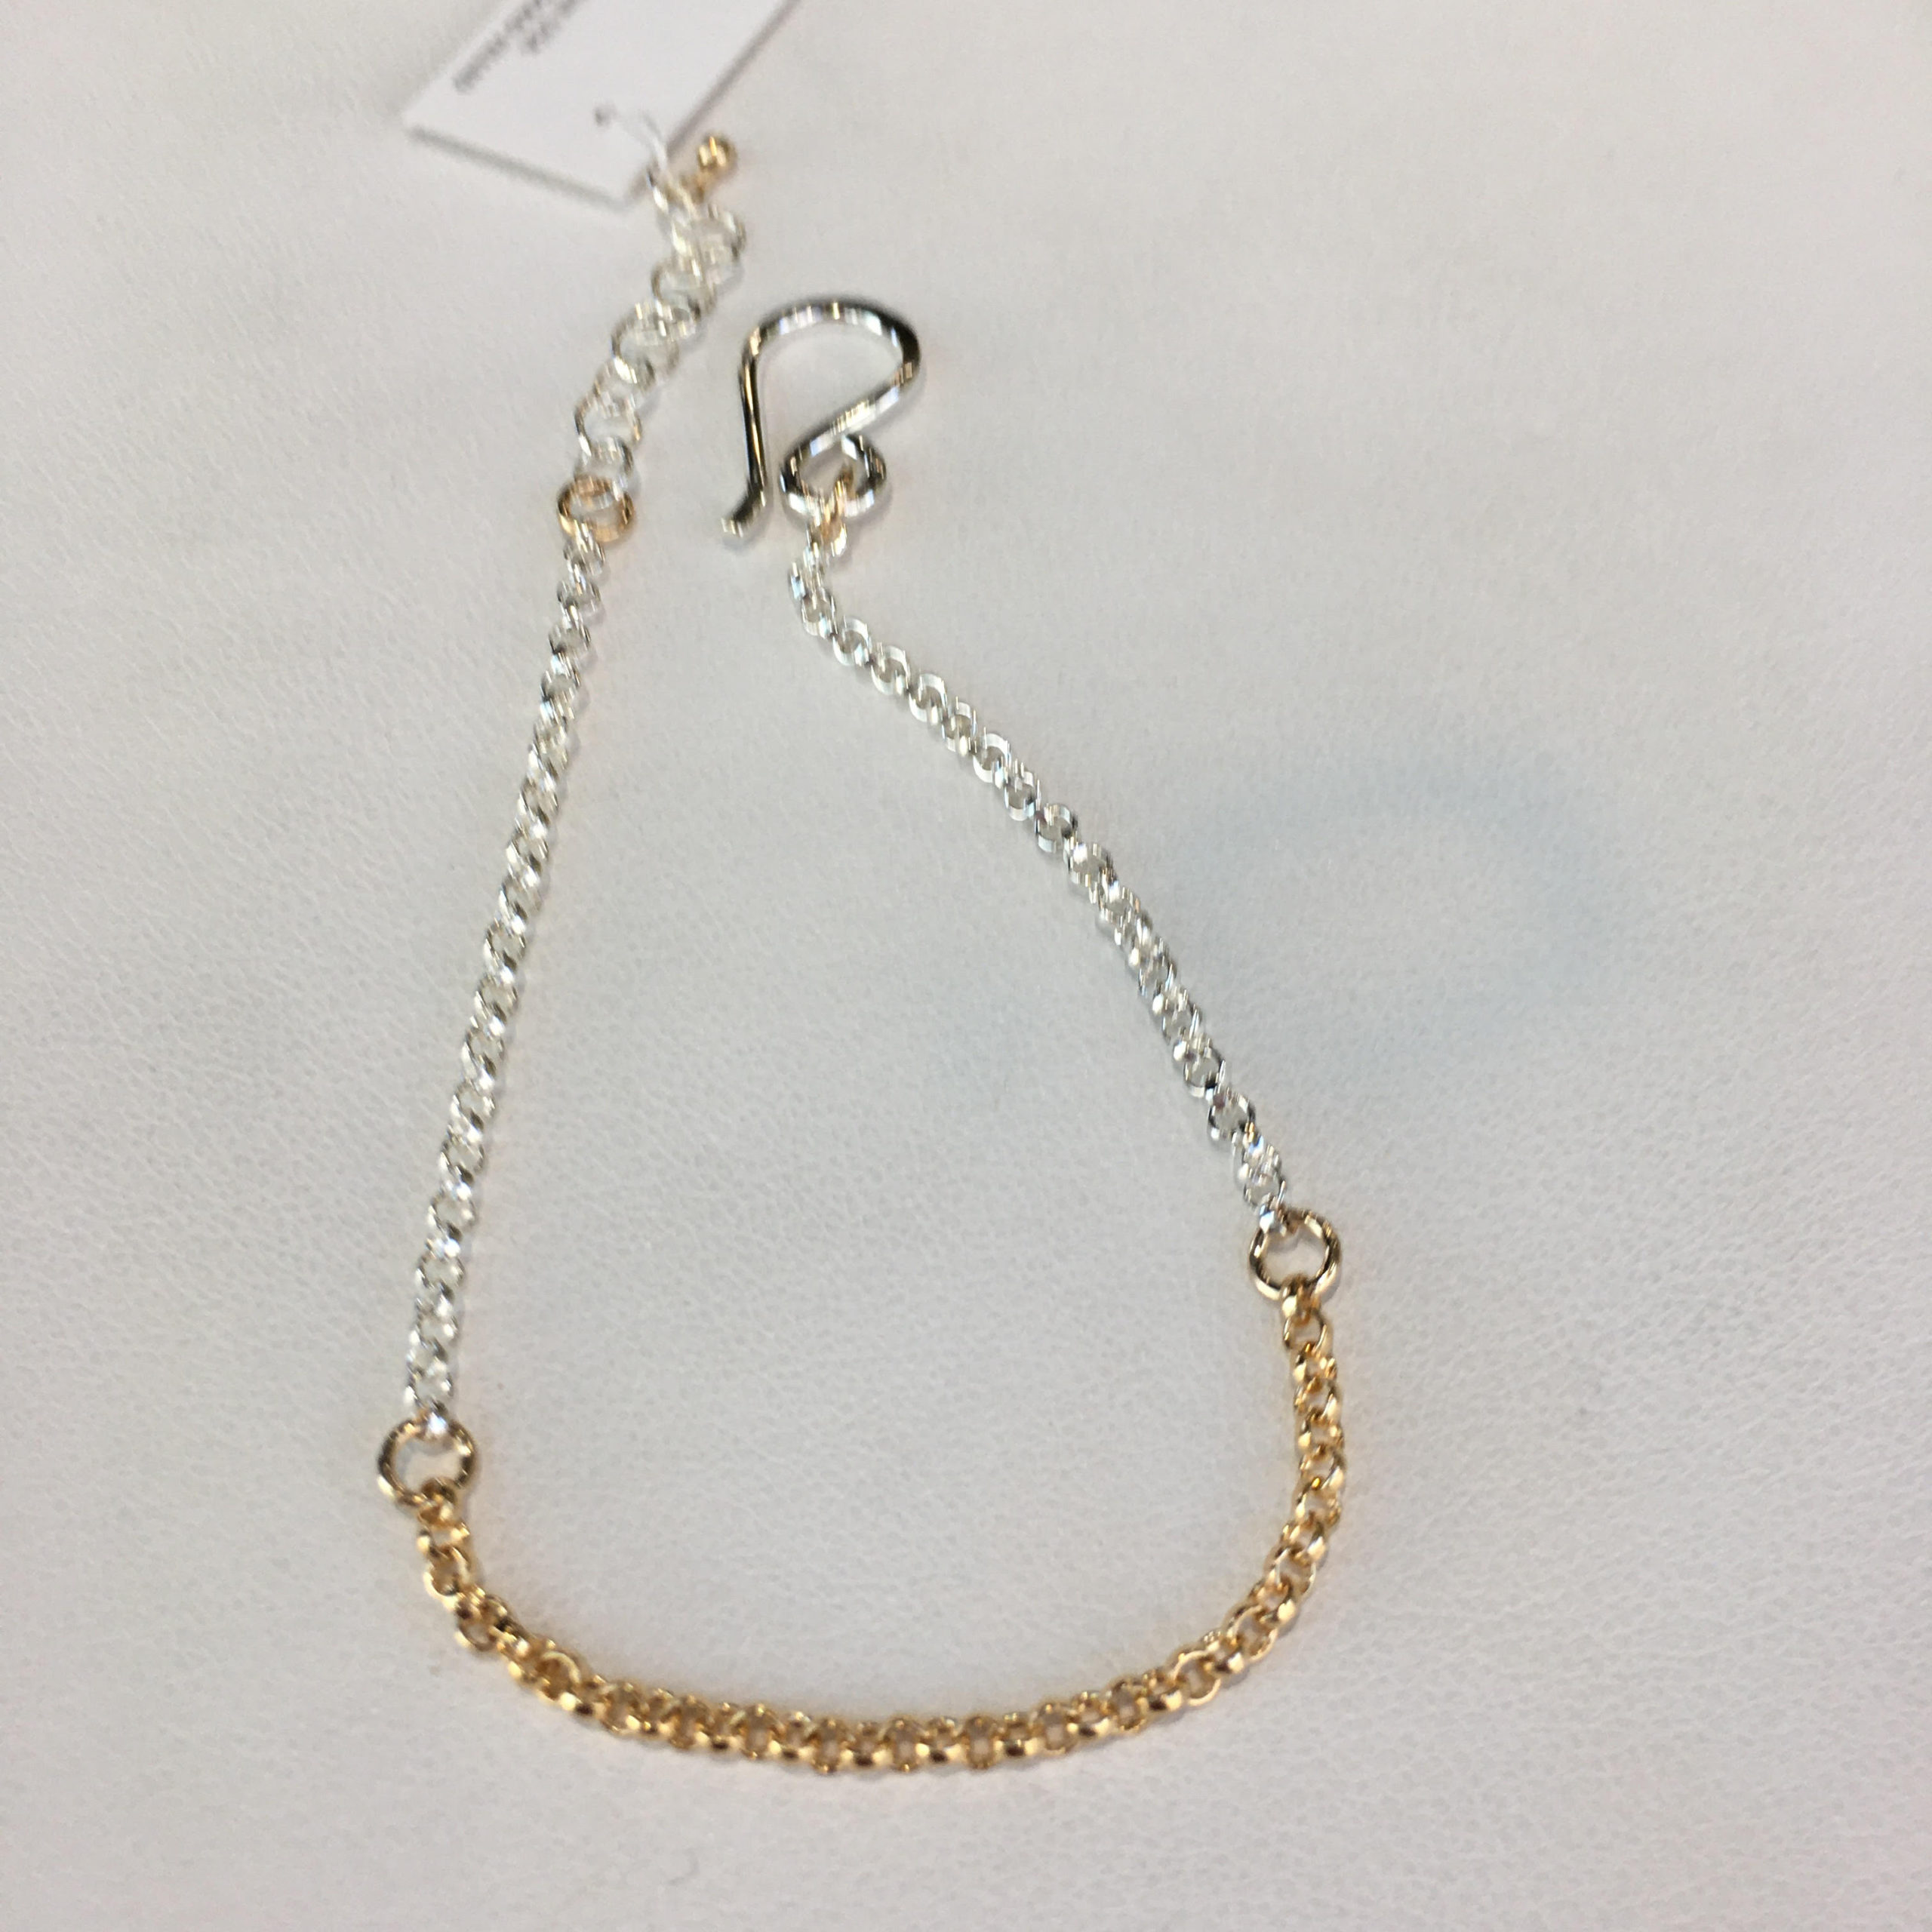 Ruby Lena Chain Bracelet 2